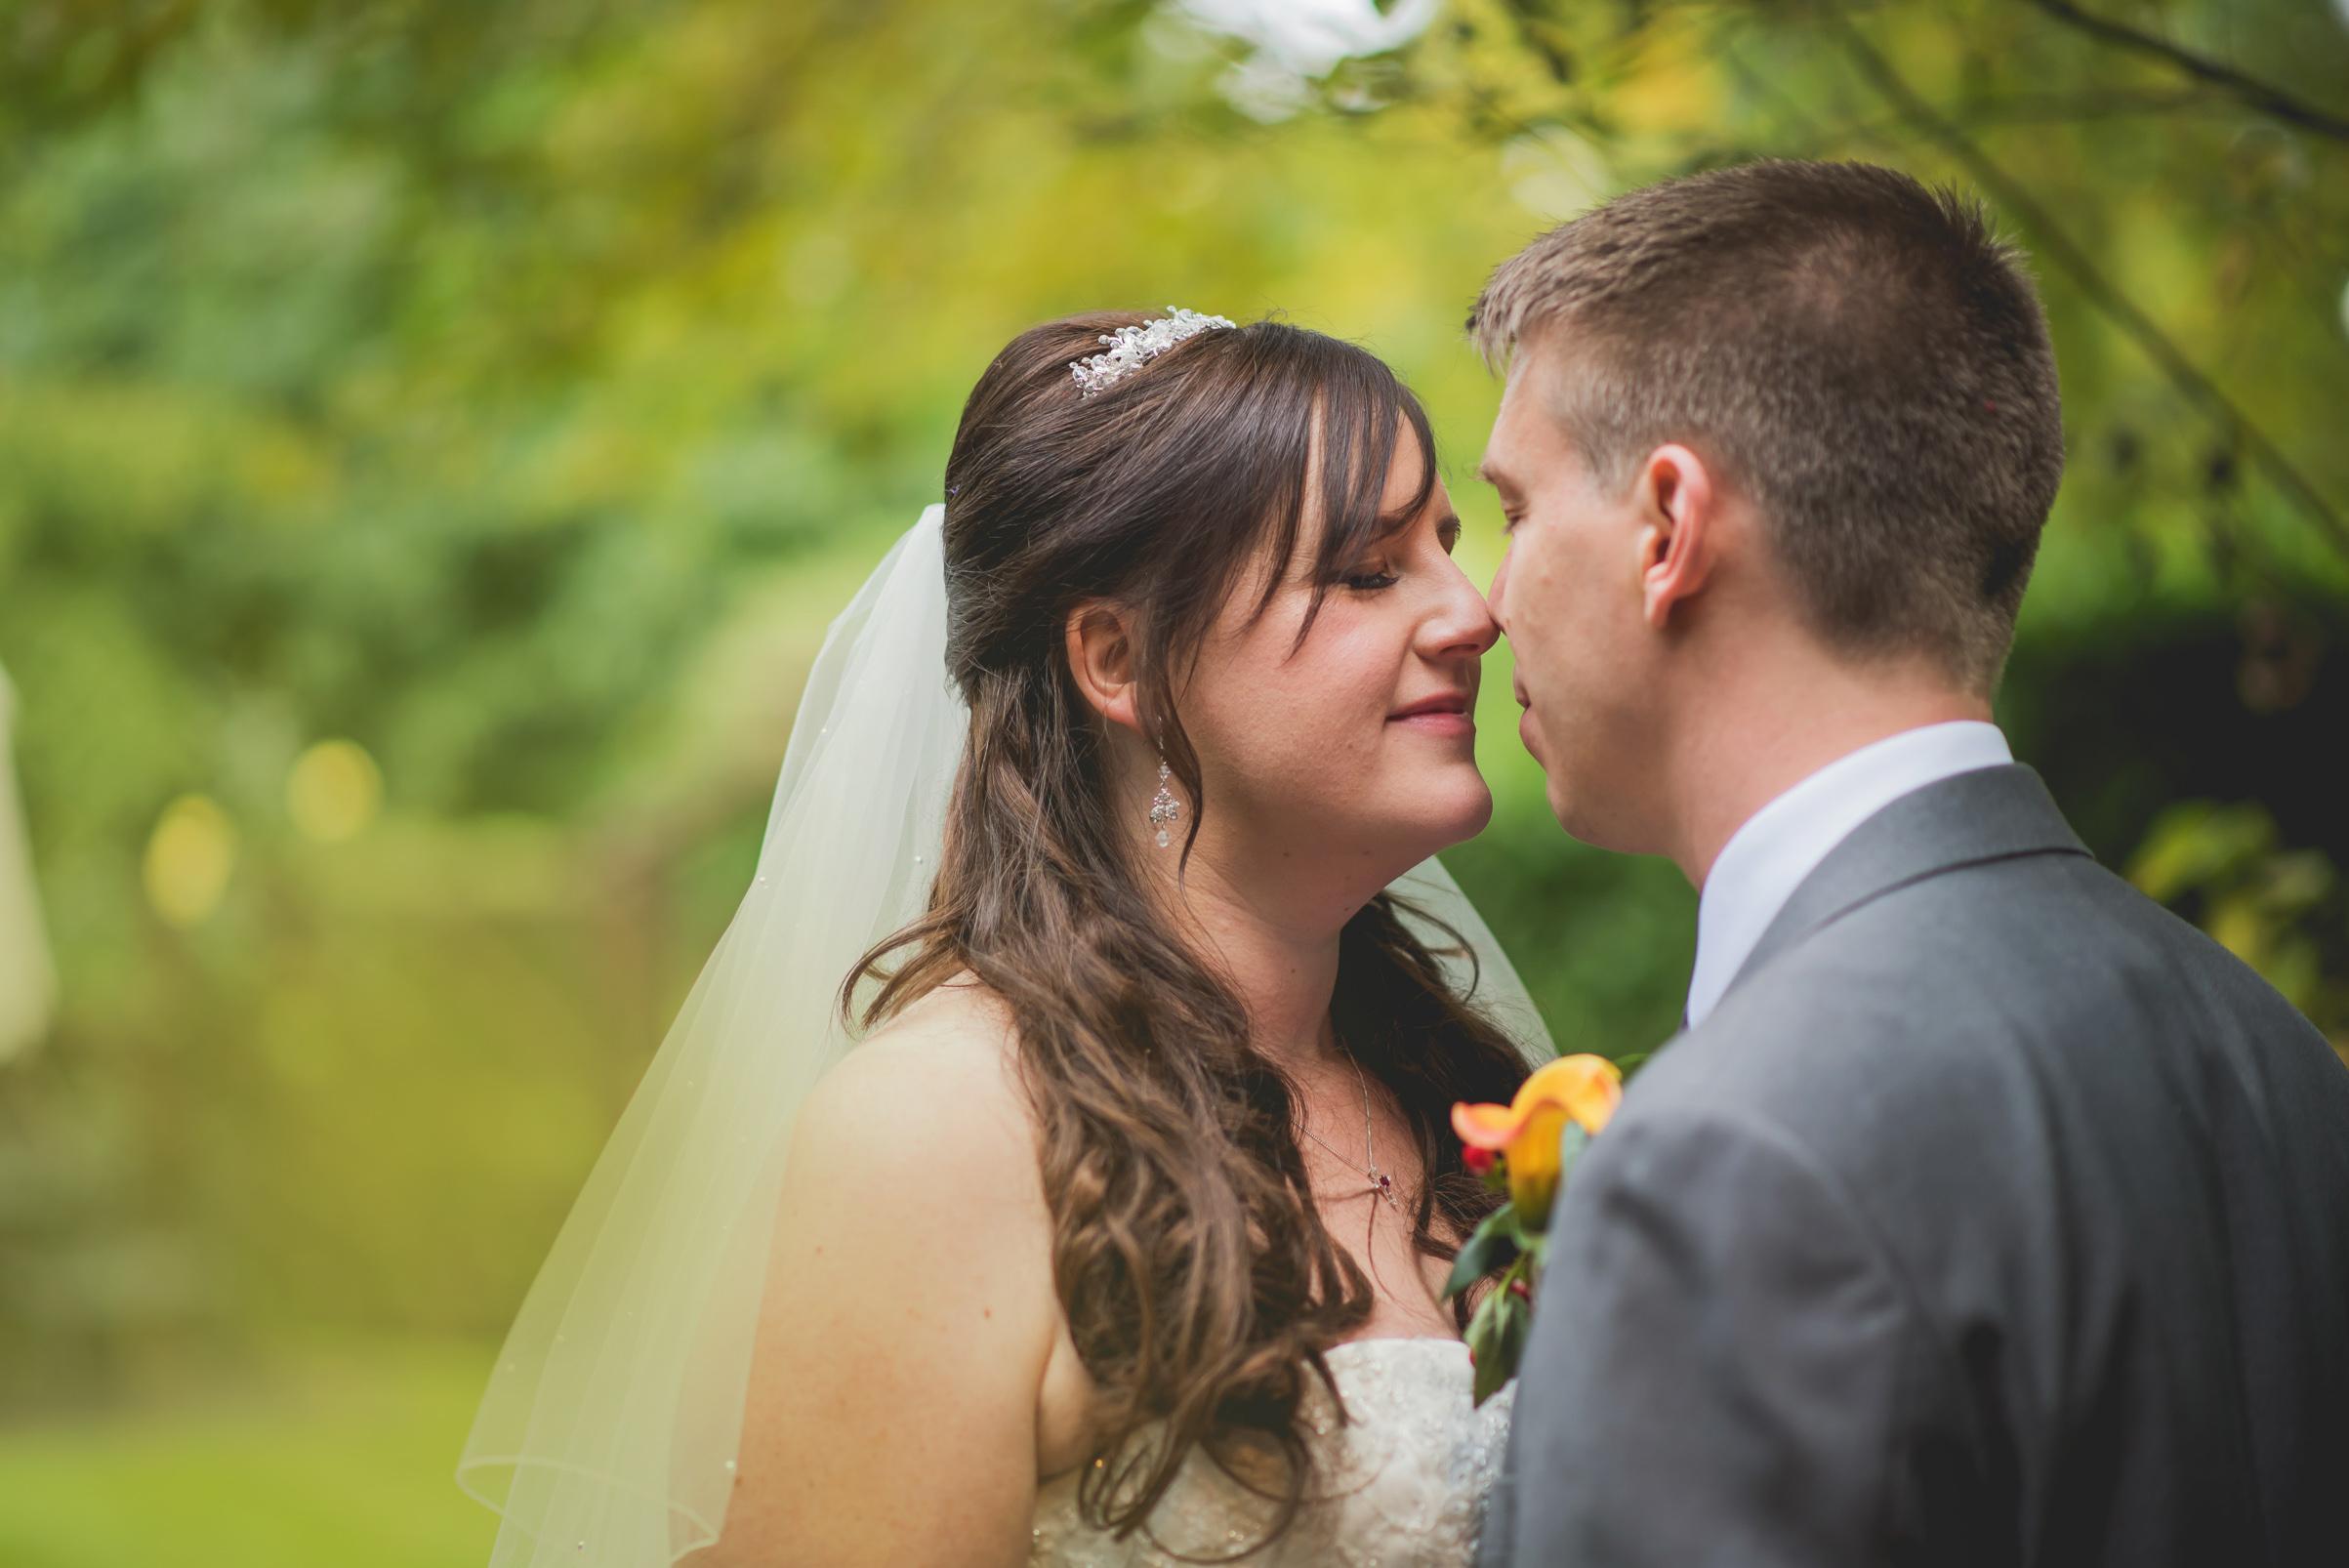 The+Fairlawns+wedding+Aldridge+StLukes+Church-164.jpg